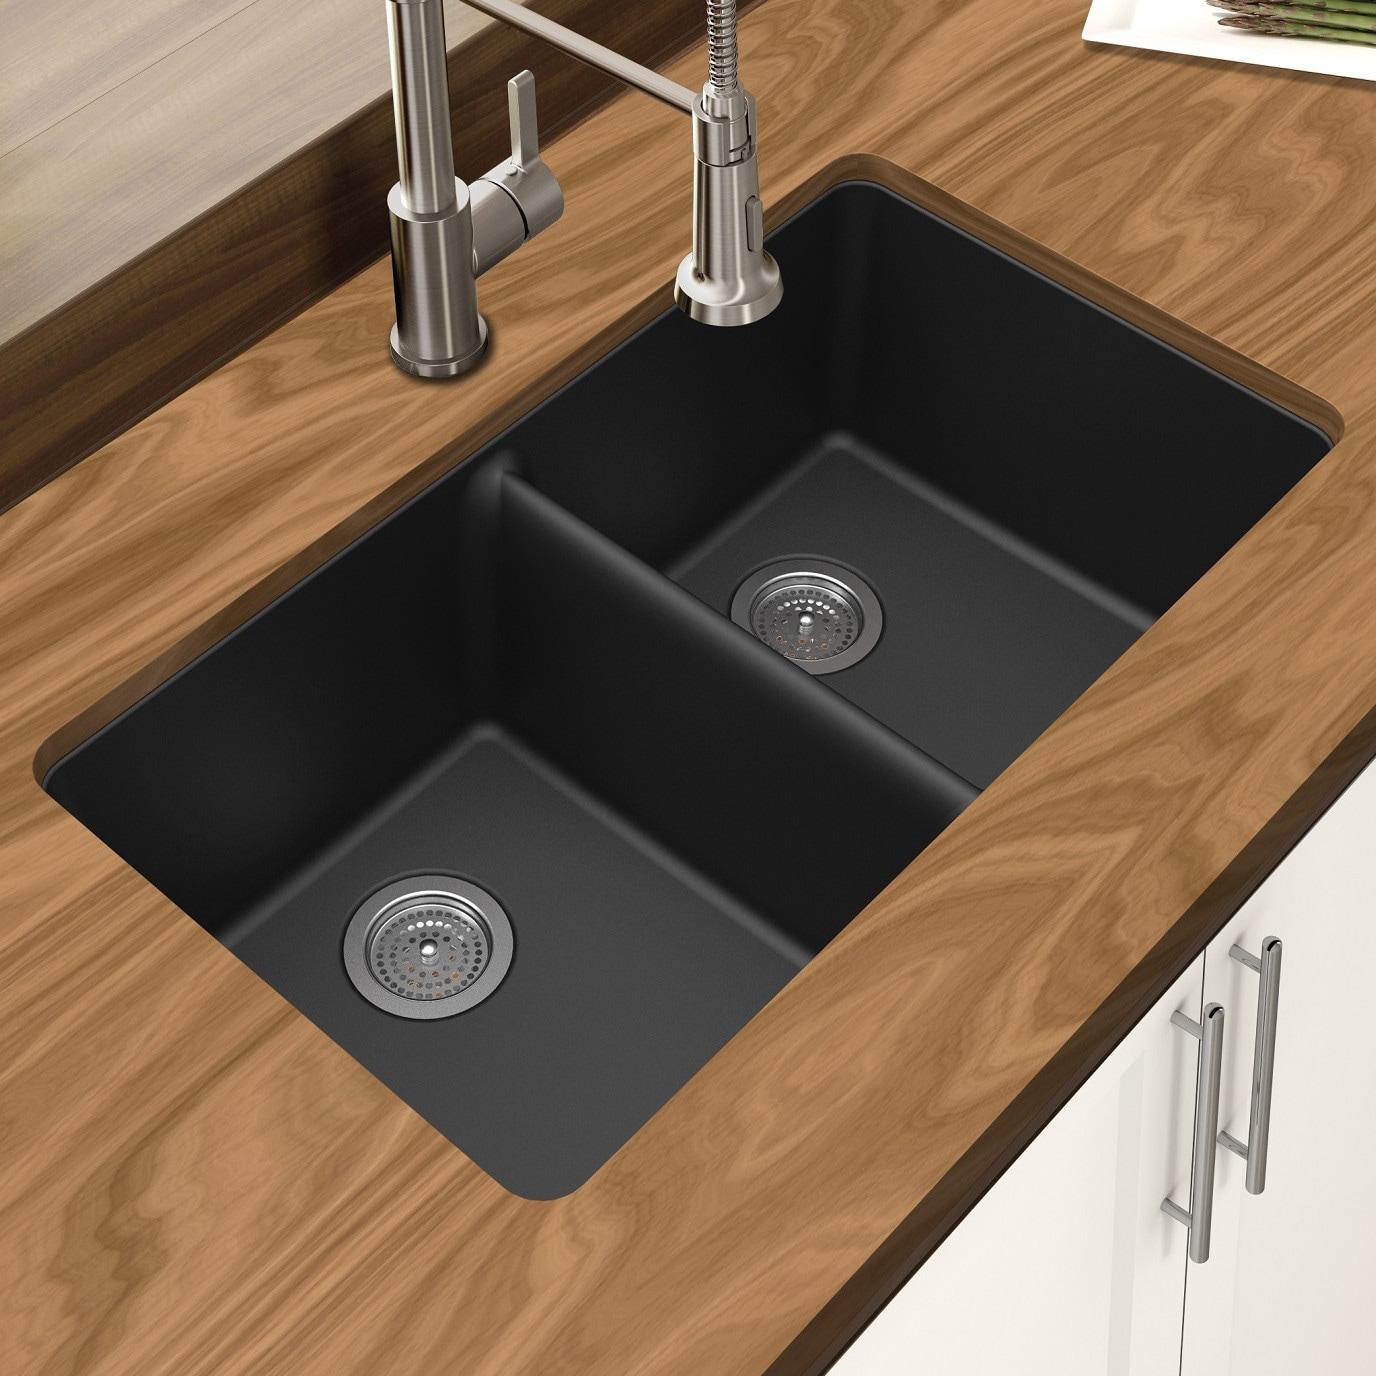 Black Under Mount Kitchen Sink Black Sink Granite Composite Sink Double Bowl 31 Inch Talkingbread Co Il